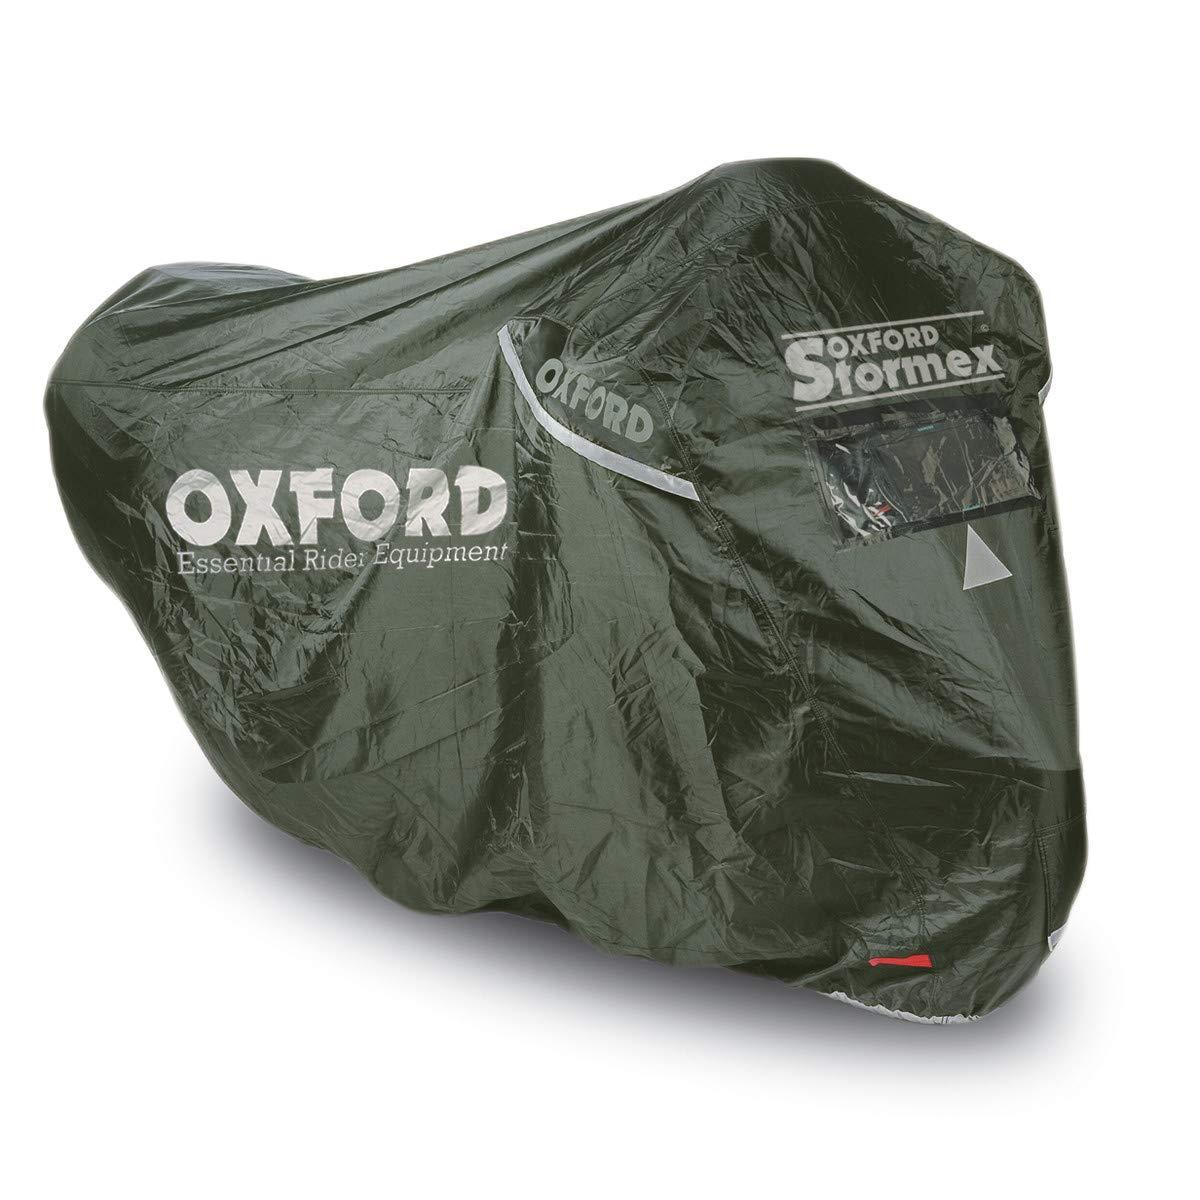 Funda Impermeable para Motocicleta Oxford Stormex Ideal para Exteriores 229 x 99 x 125 cm versi/ón 2016 Color Negro